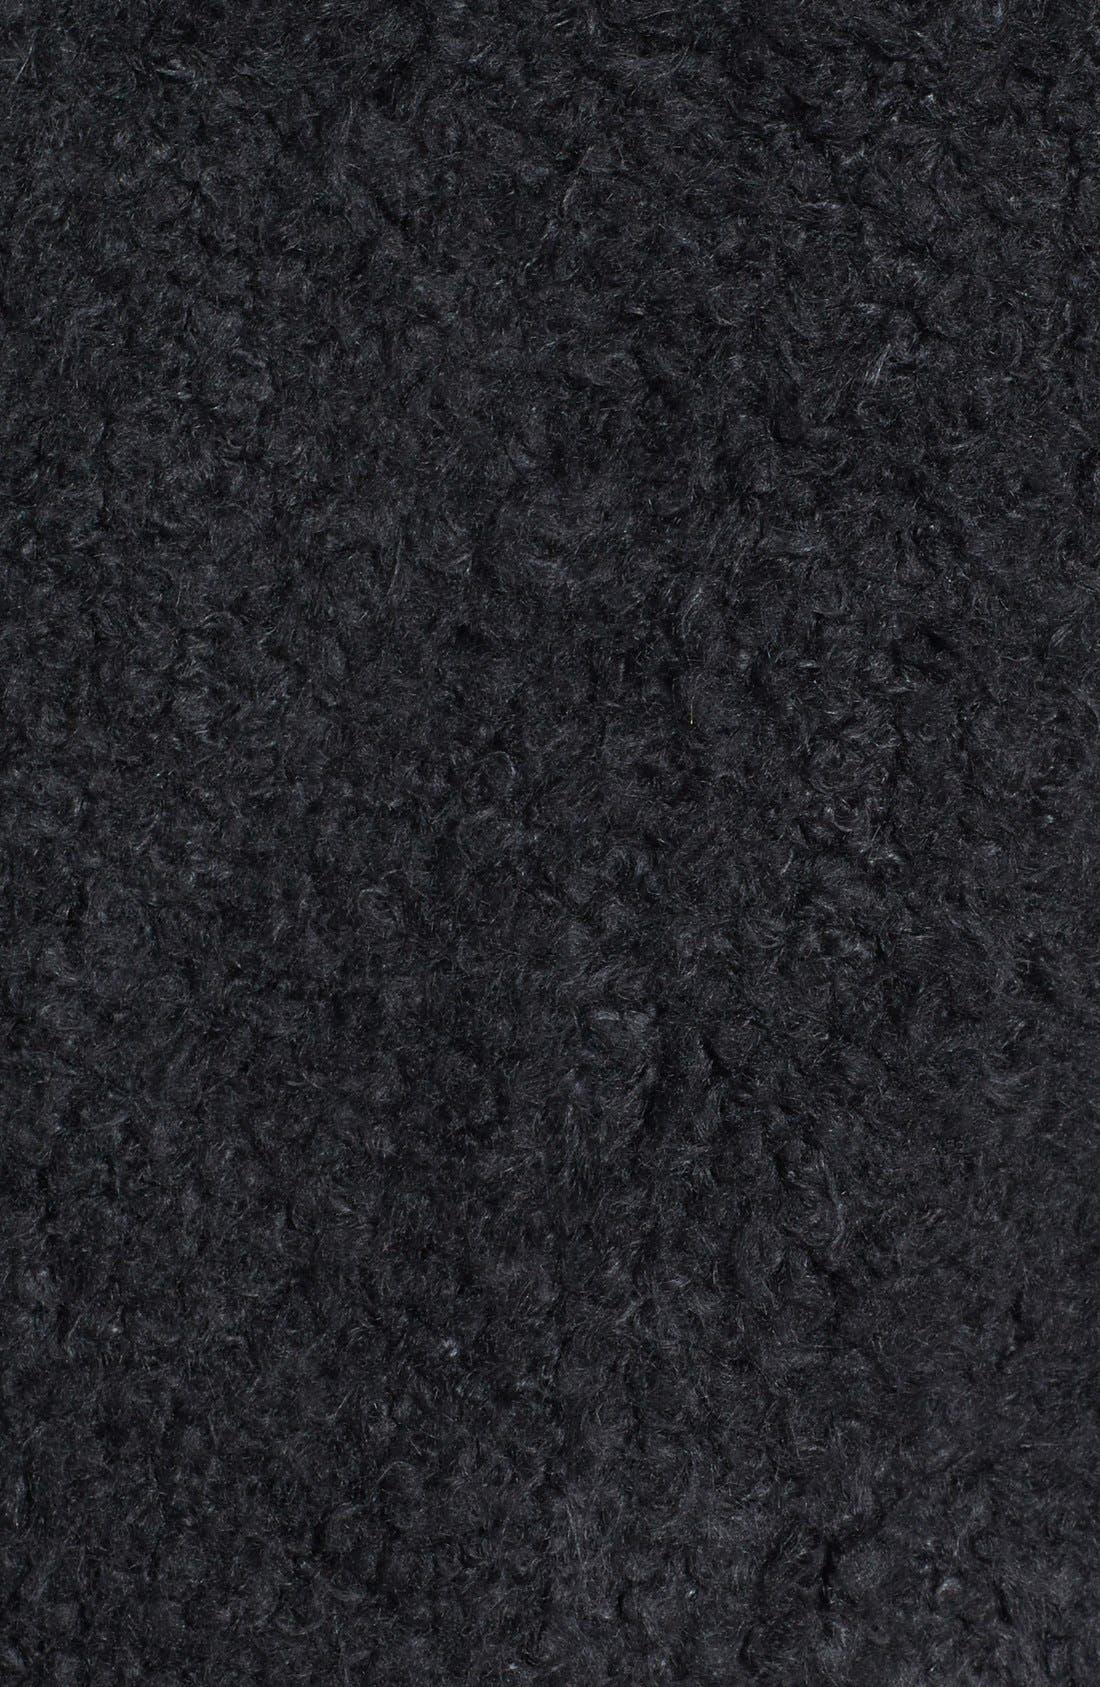 Alternate Image 3  - Topshop 'Teddy' Faux Fur Peacoat